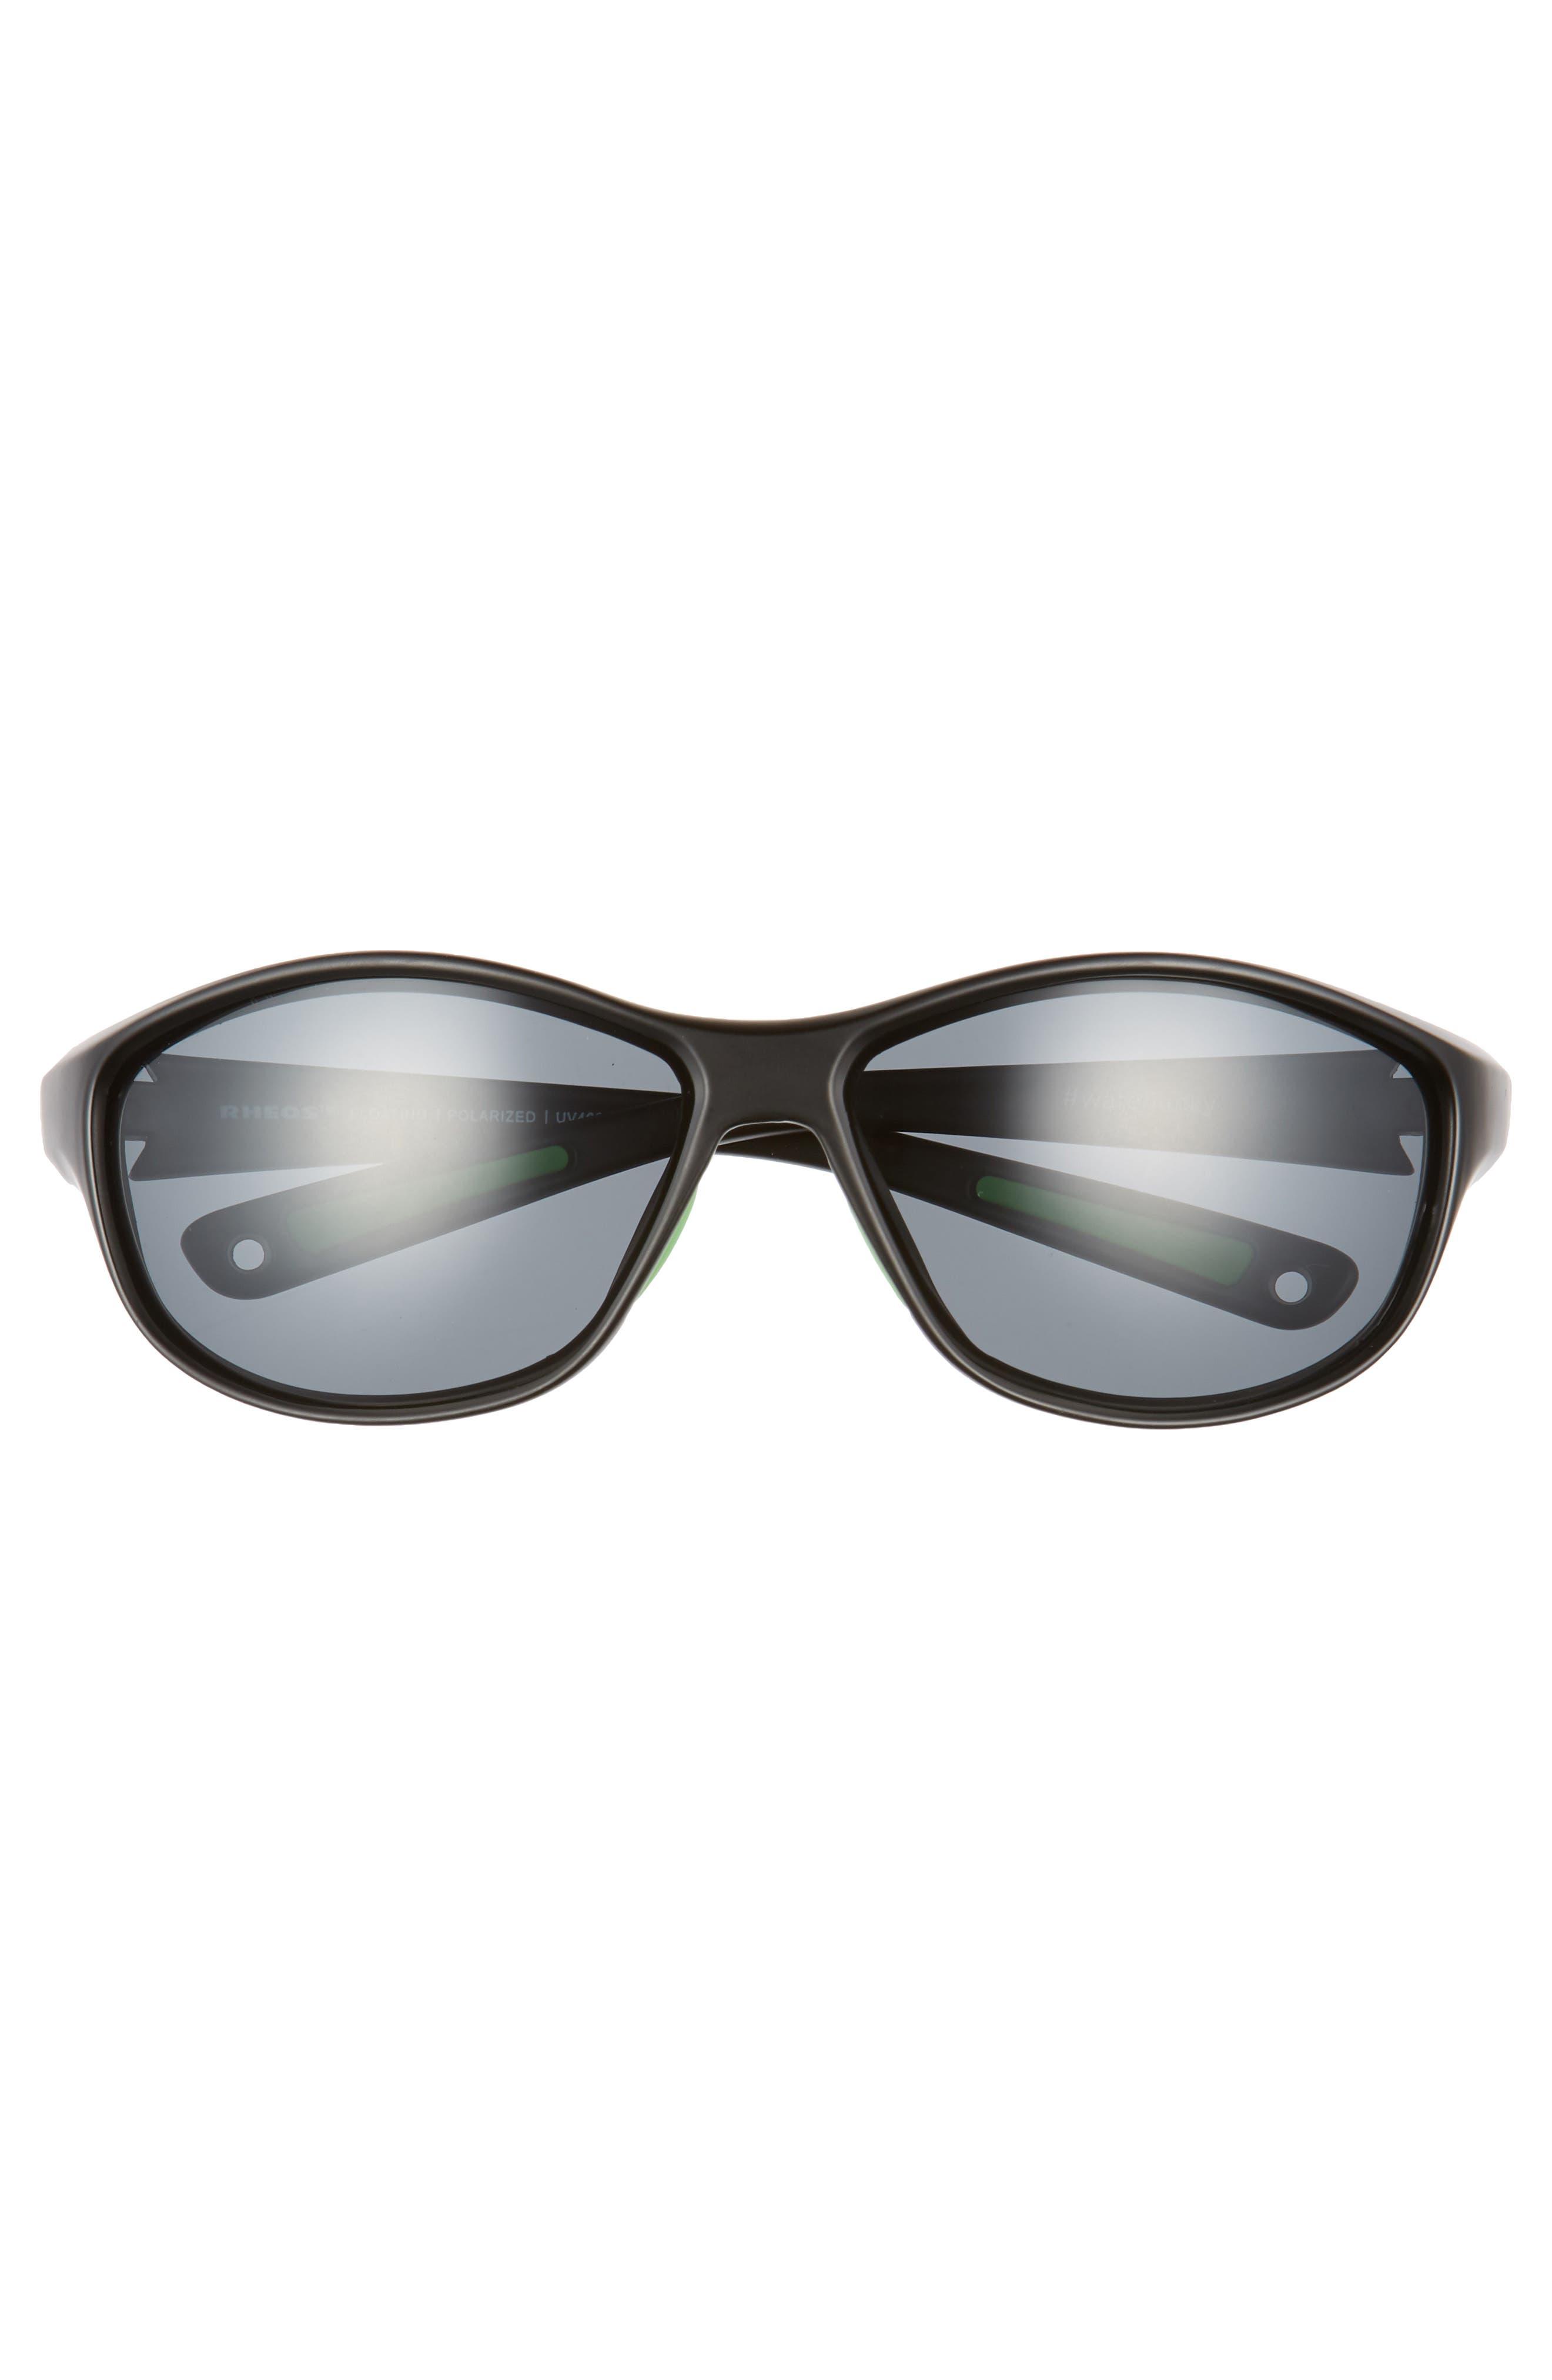 Bahias Floating 60mm Polarized Sunglasses,                             Alternate thumbnail 2, color,                             GUNMETAL / GUNMETAL